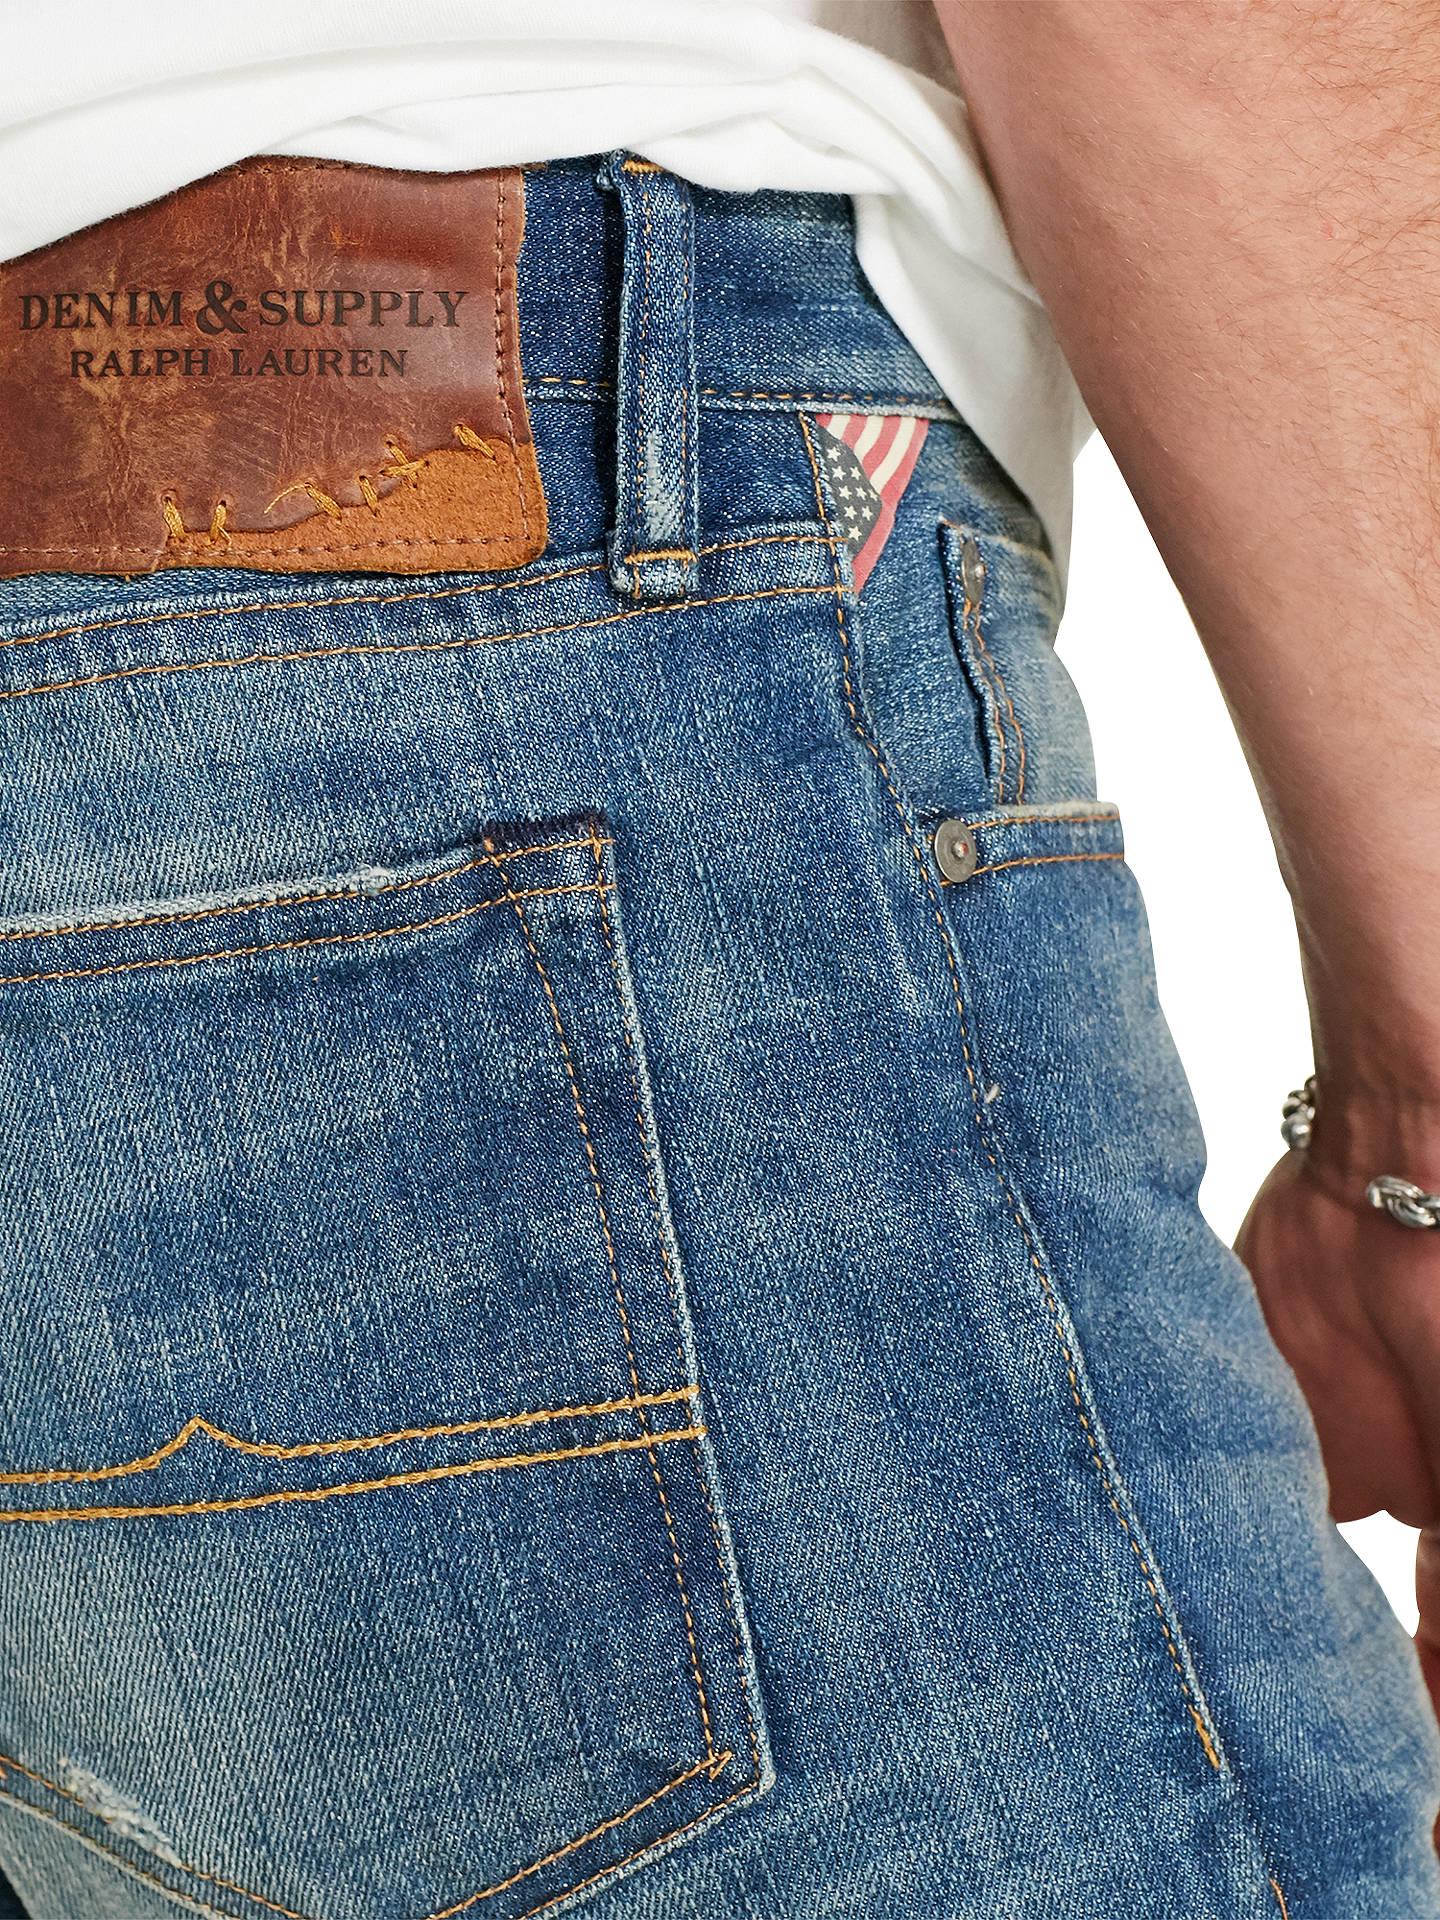 6133d5e5a Denim   Supply Ralph Lauren Slim Fit Jeans